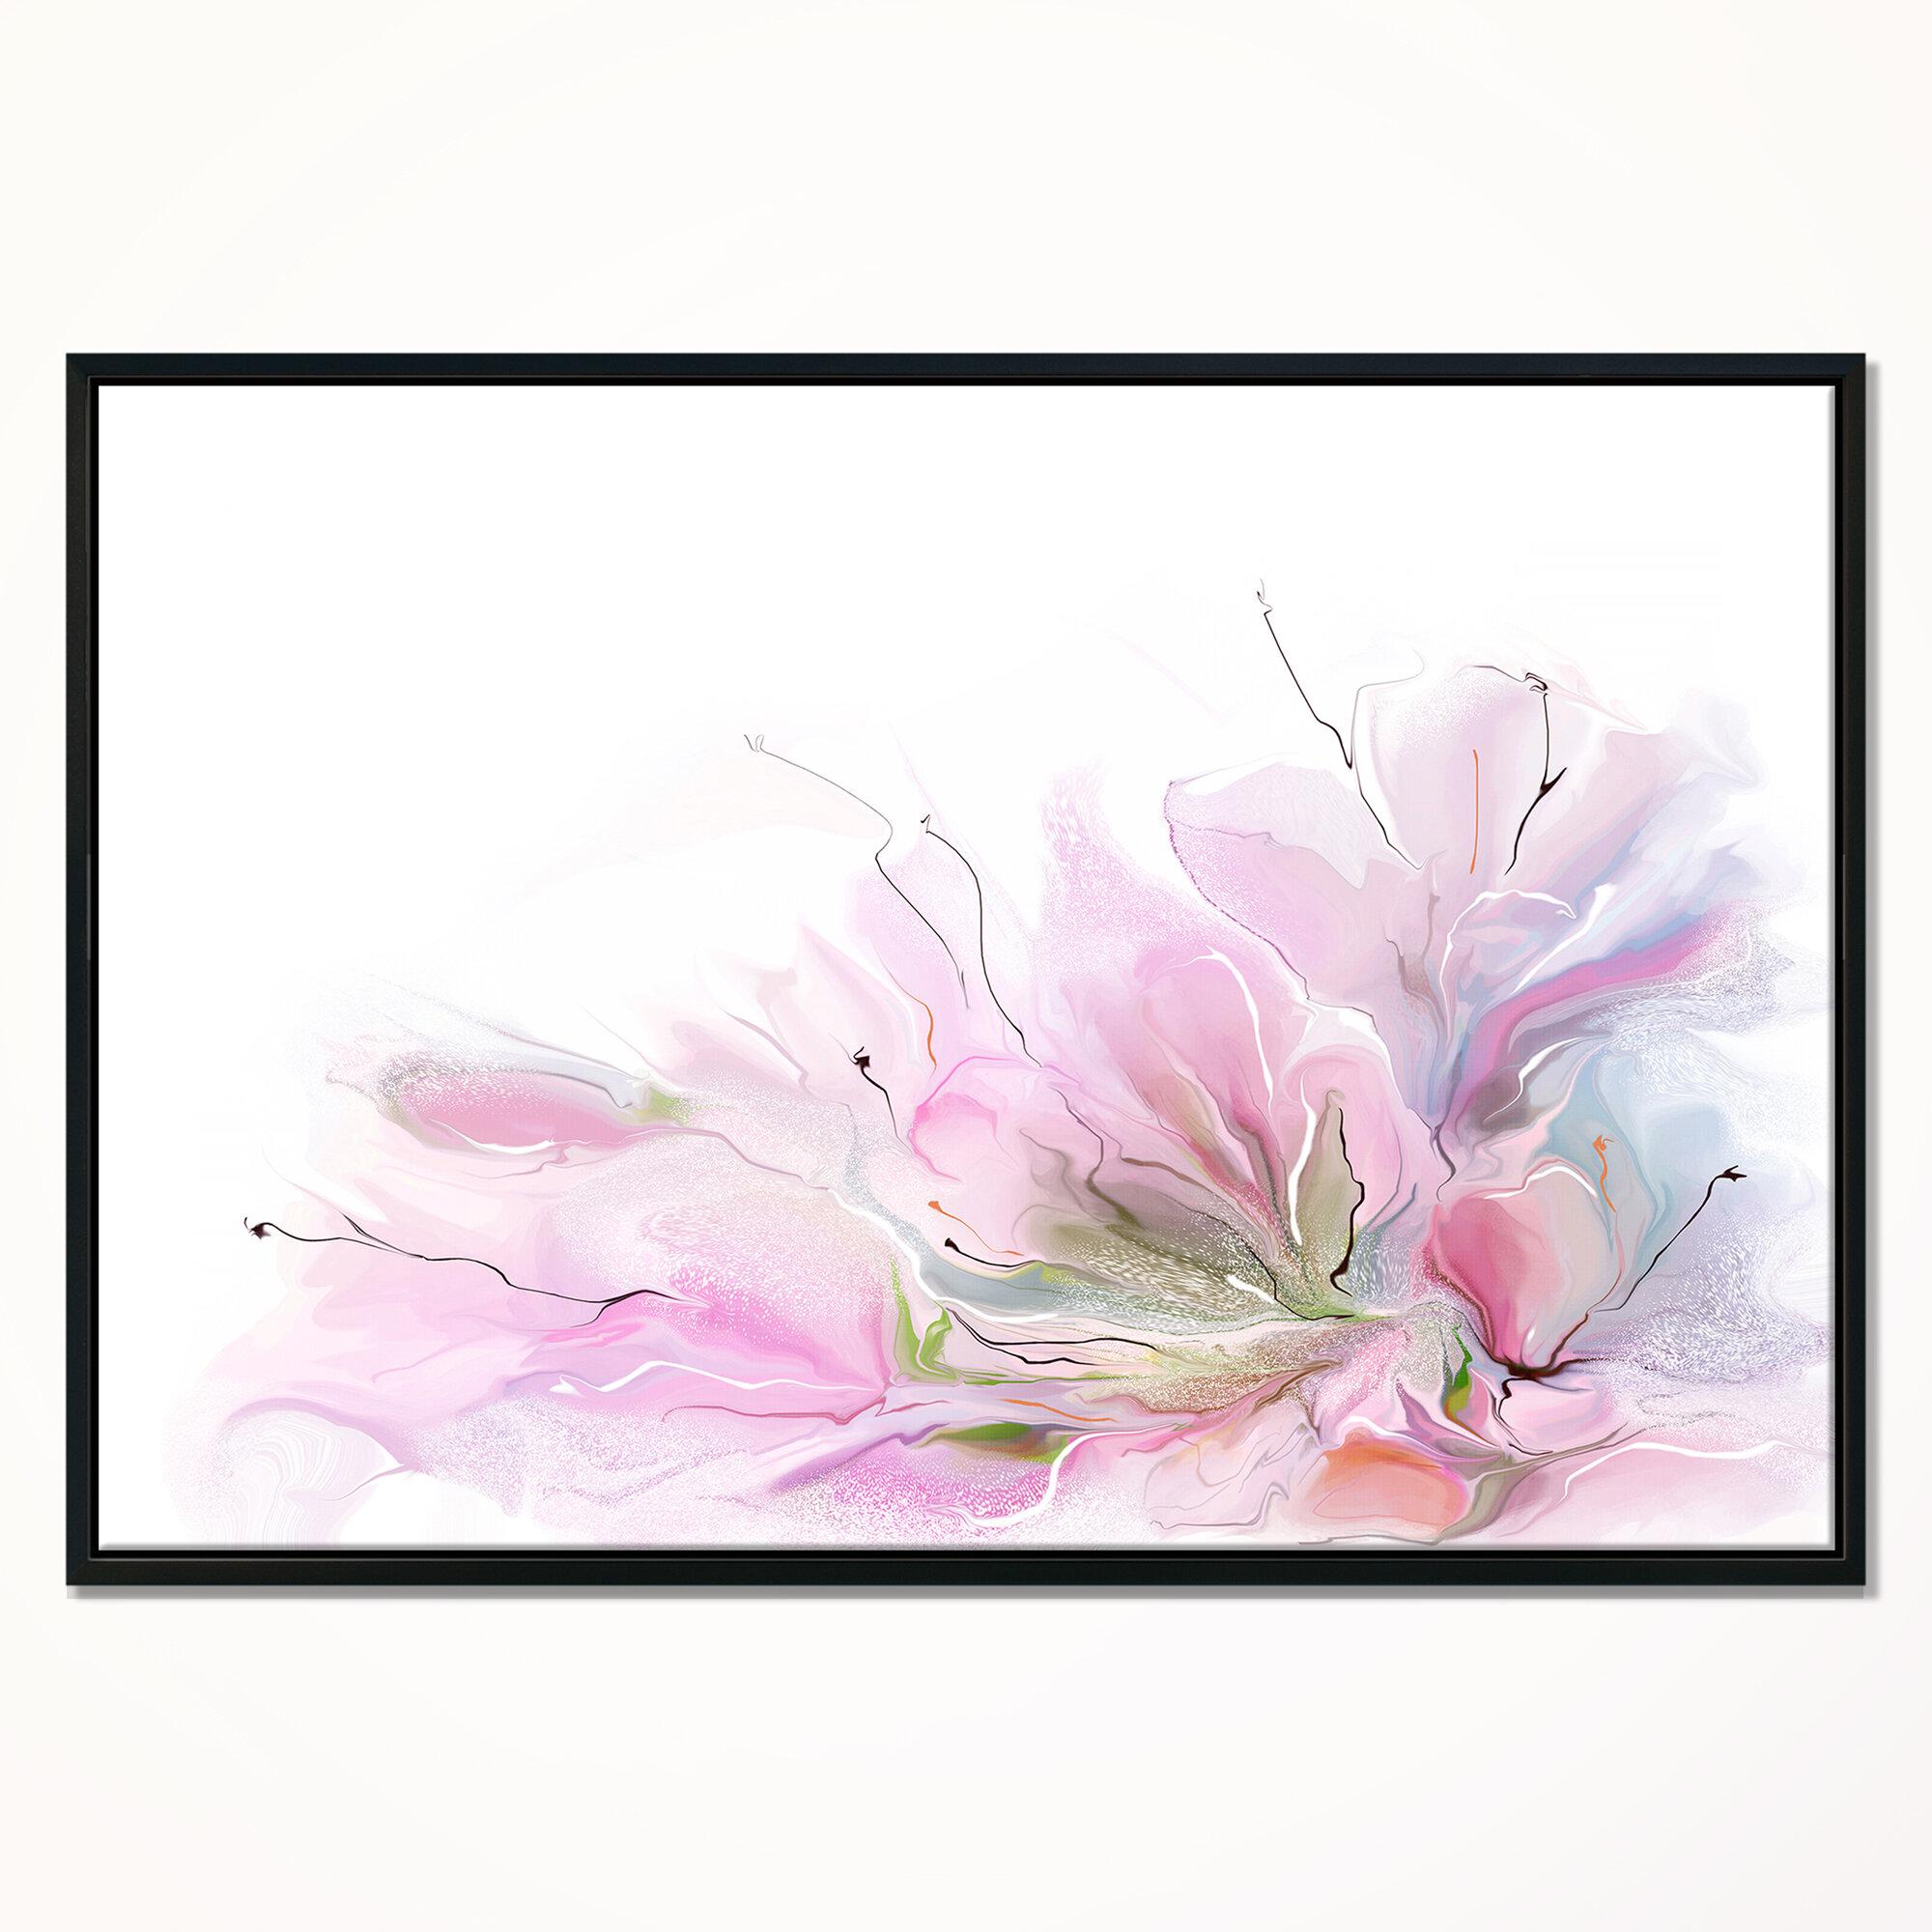 East Urban Home Lovely Pink Flowers Framed Graphic Art Print On